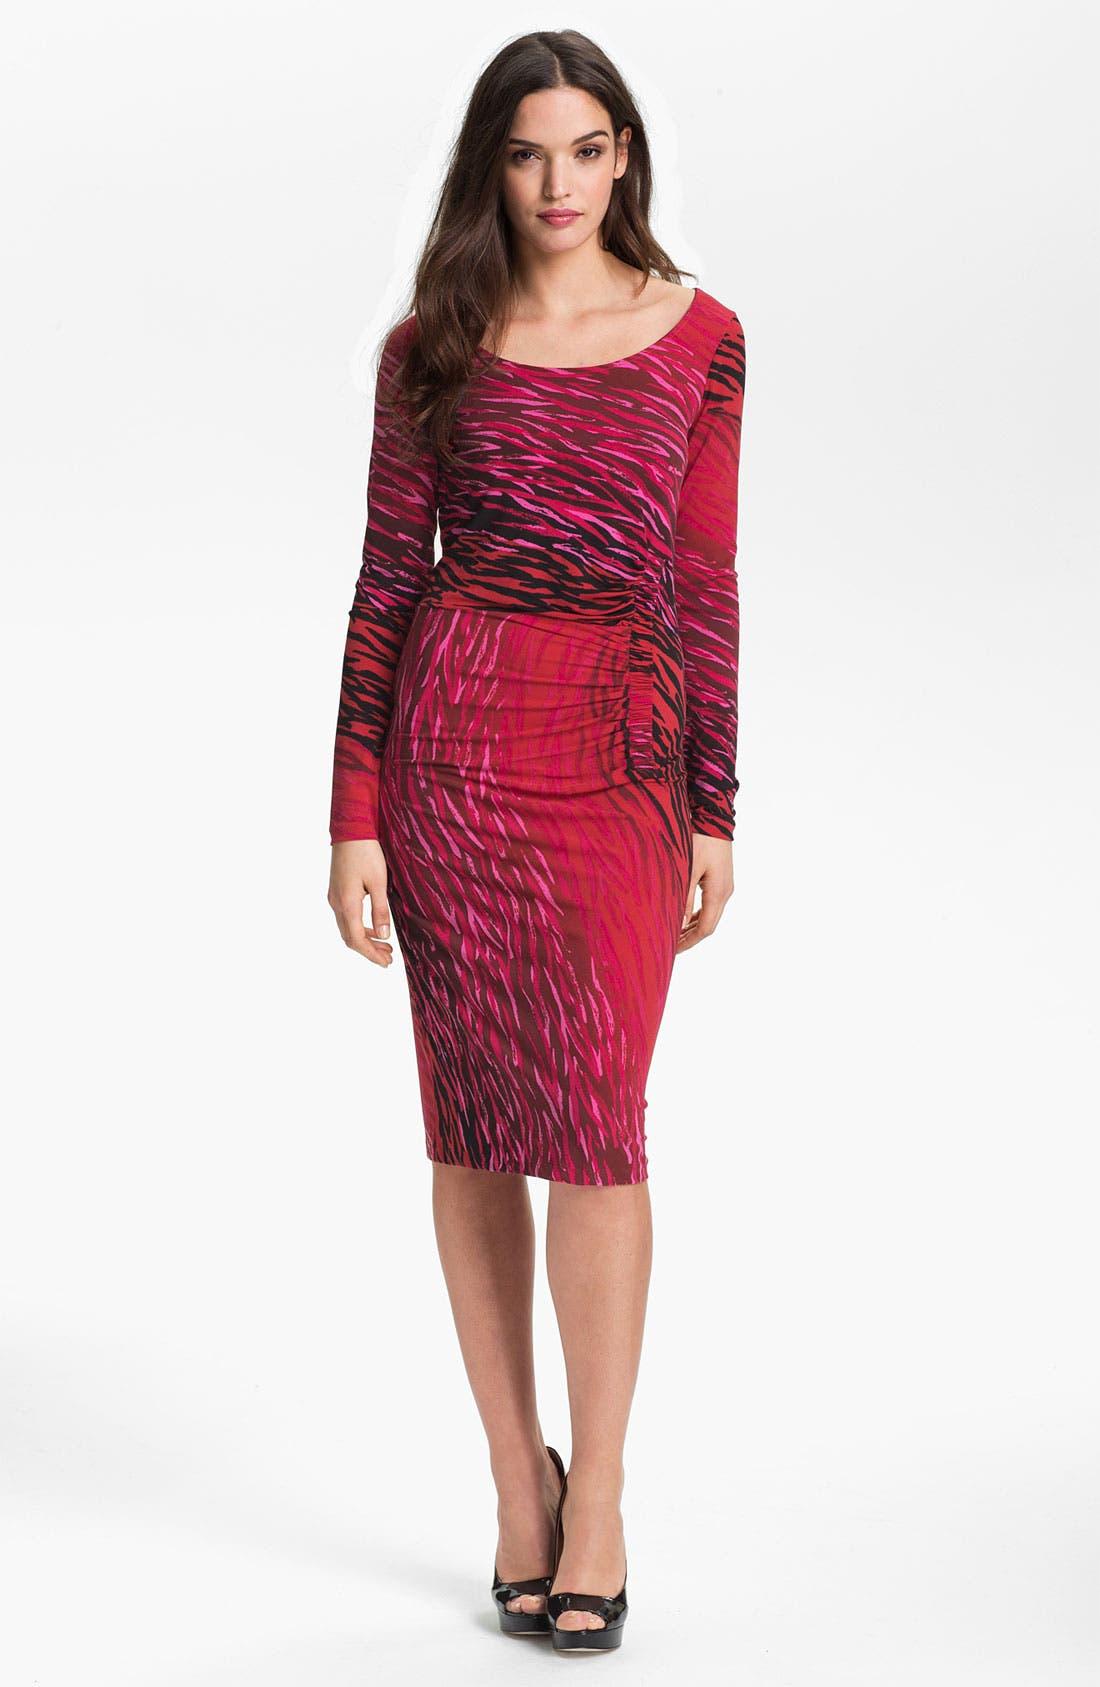 Alternate Image 1 Selected - Anne Klein Ombré Zebra Print Dress